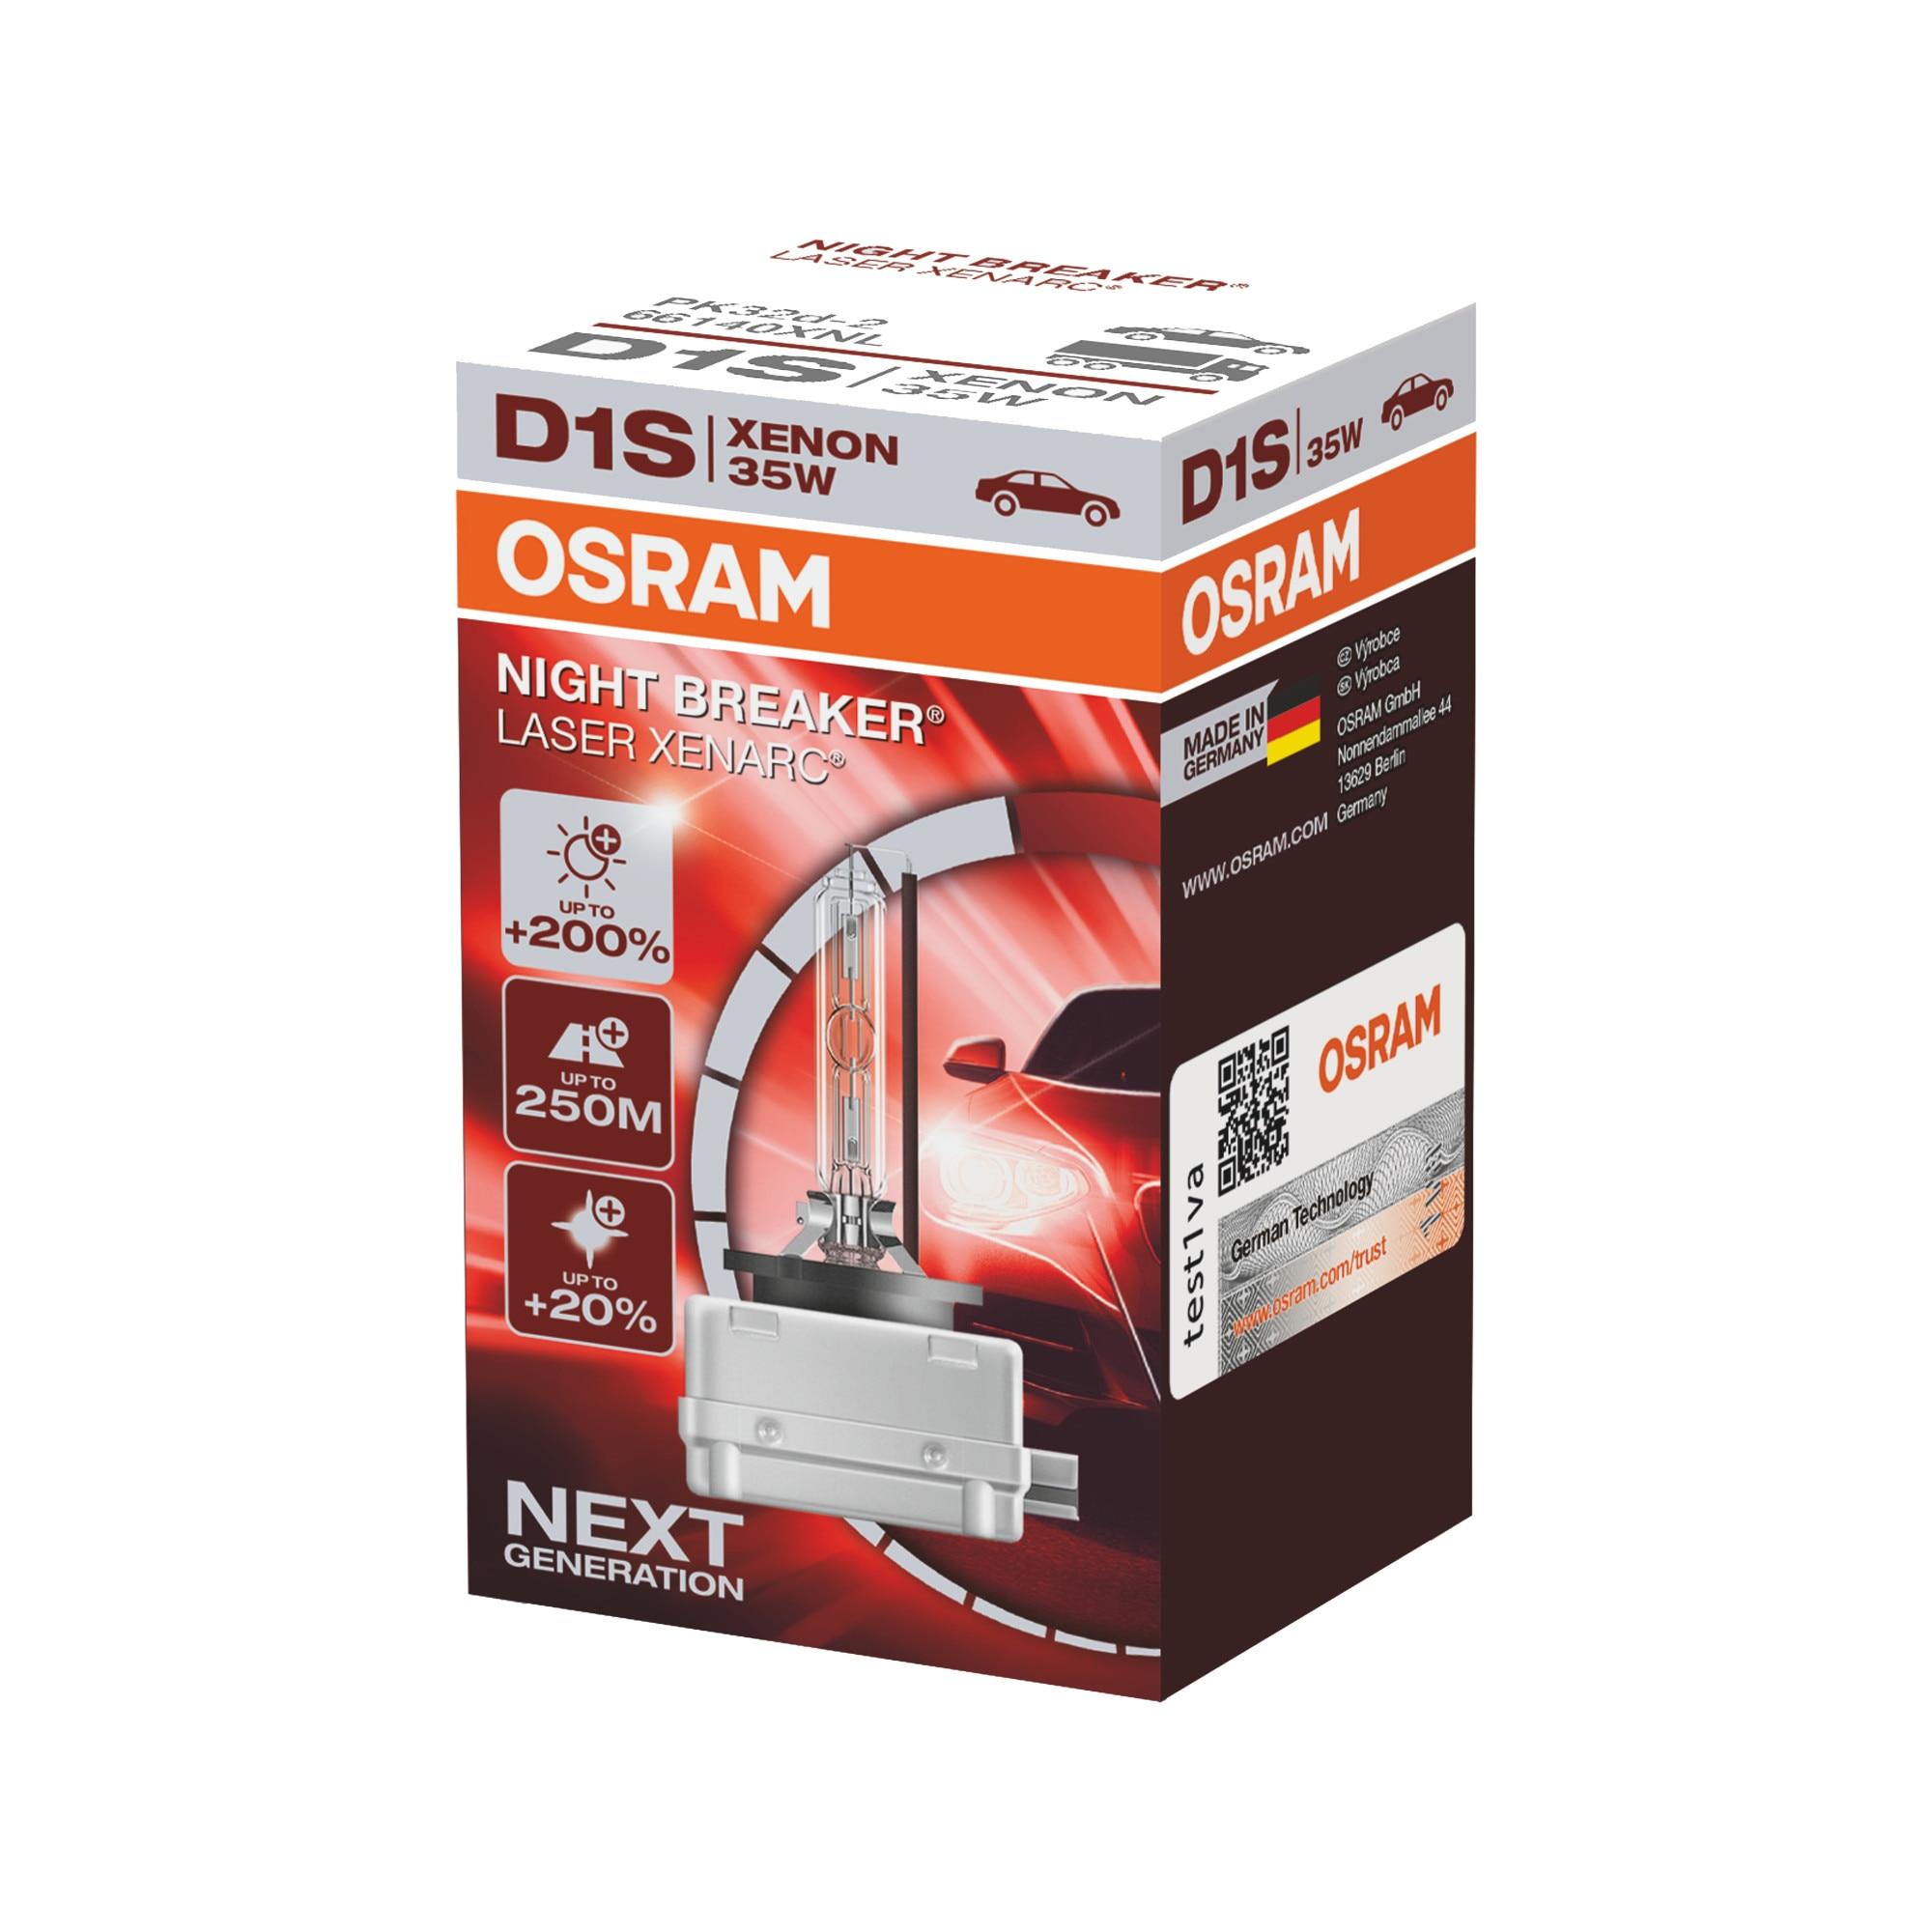 Fotografie Bec auto far xenon Osram D1S Night Breaker Laser +200%, 35W, PK32d-2, cutie 1buc